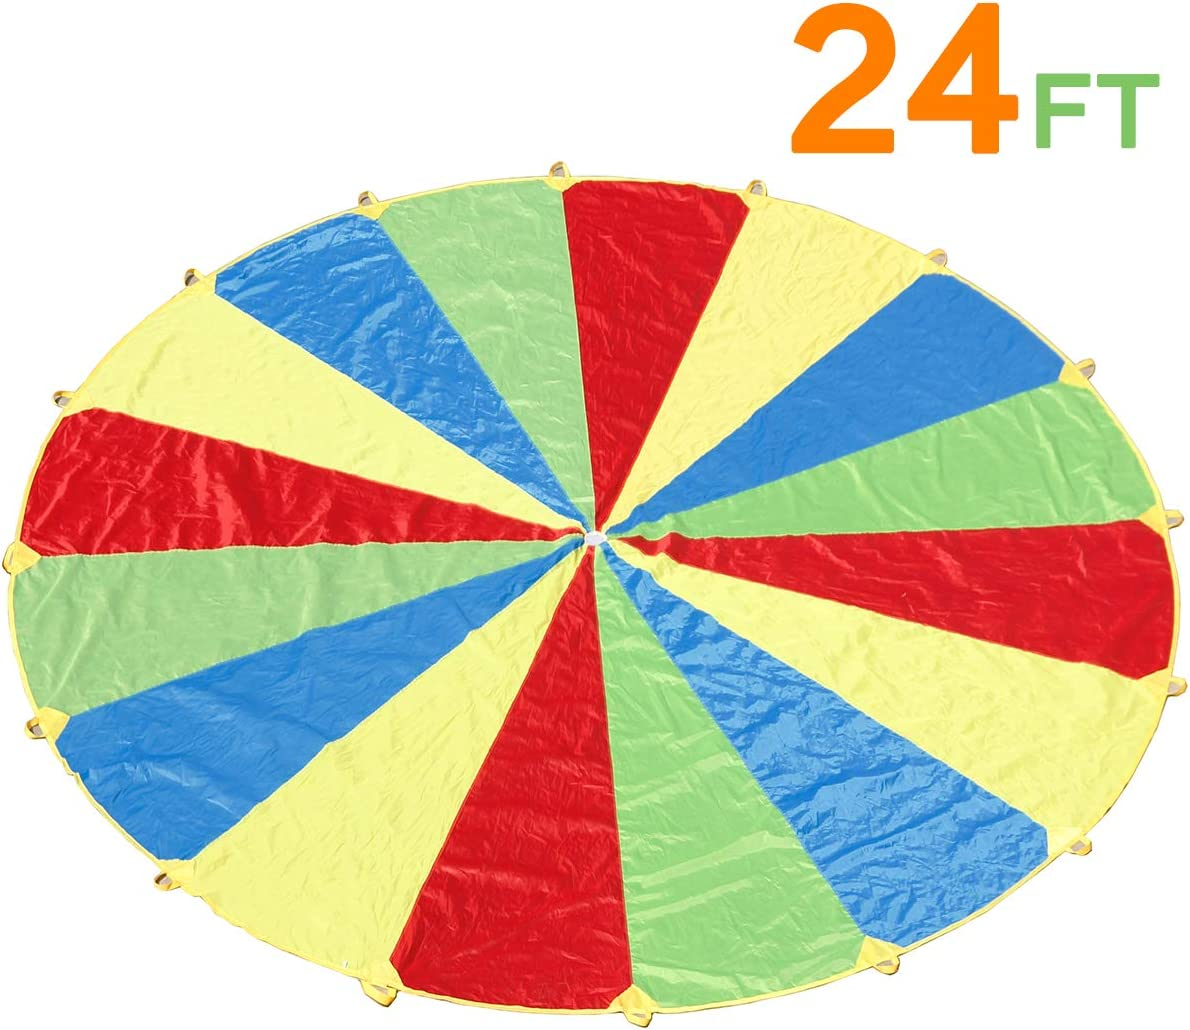 16ft 20ft 24ft Kids Play Parachute